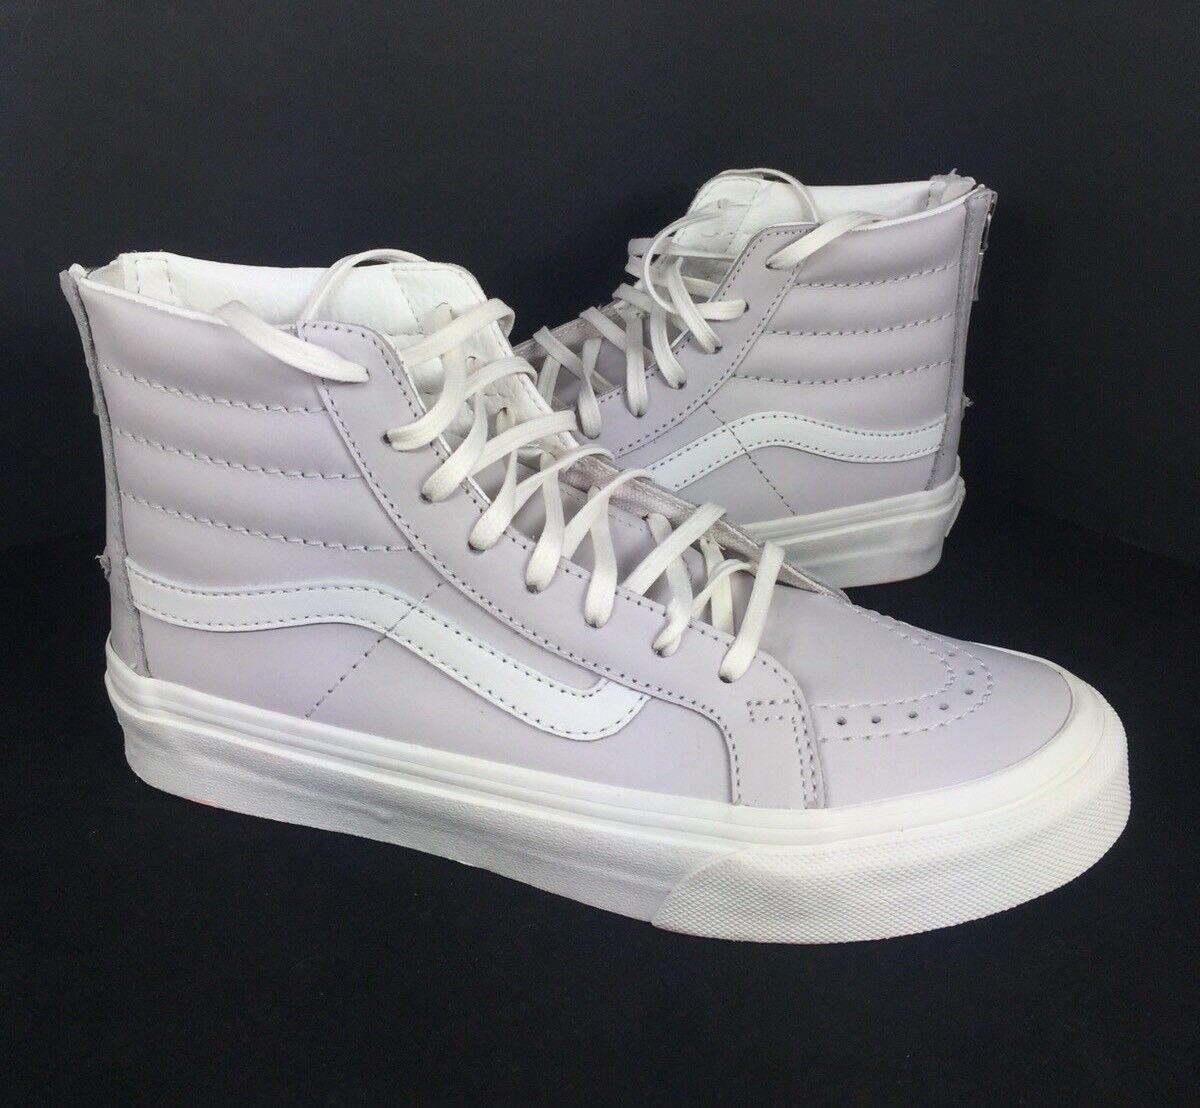 NEW Vans SK8 Hi Top Leather Slim Zip Shoes Unisex Womens Wind Chime Gray 5.5 6